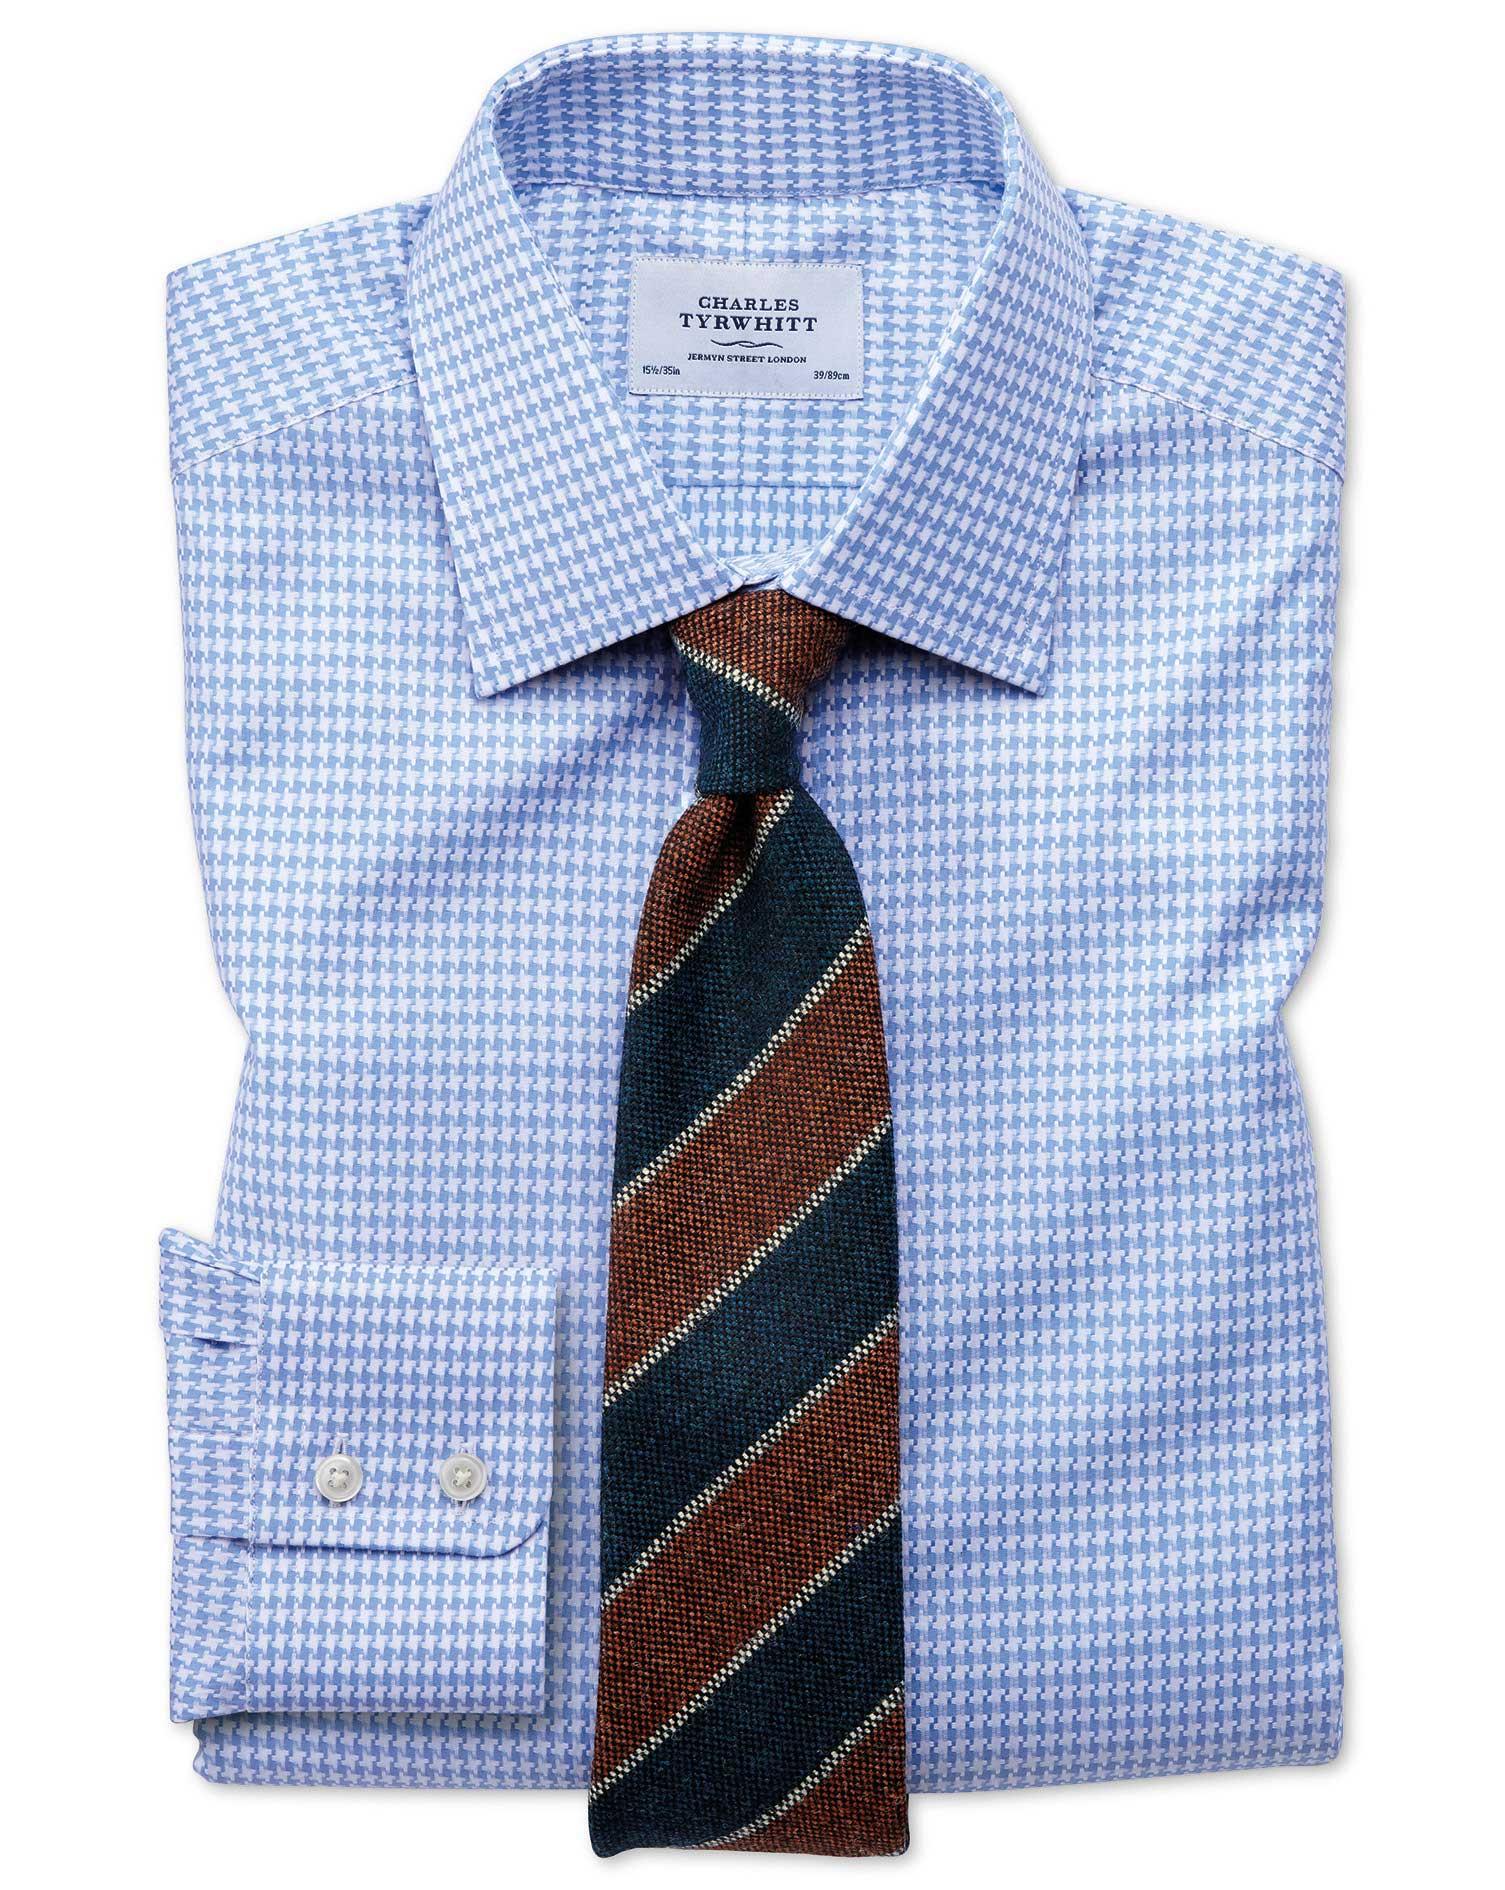 Slim Fit Large Puppytooth Sky Blue Shirt Charles Tyrwhitt